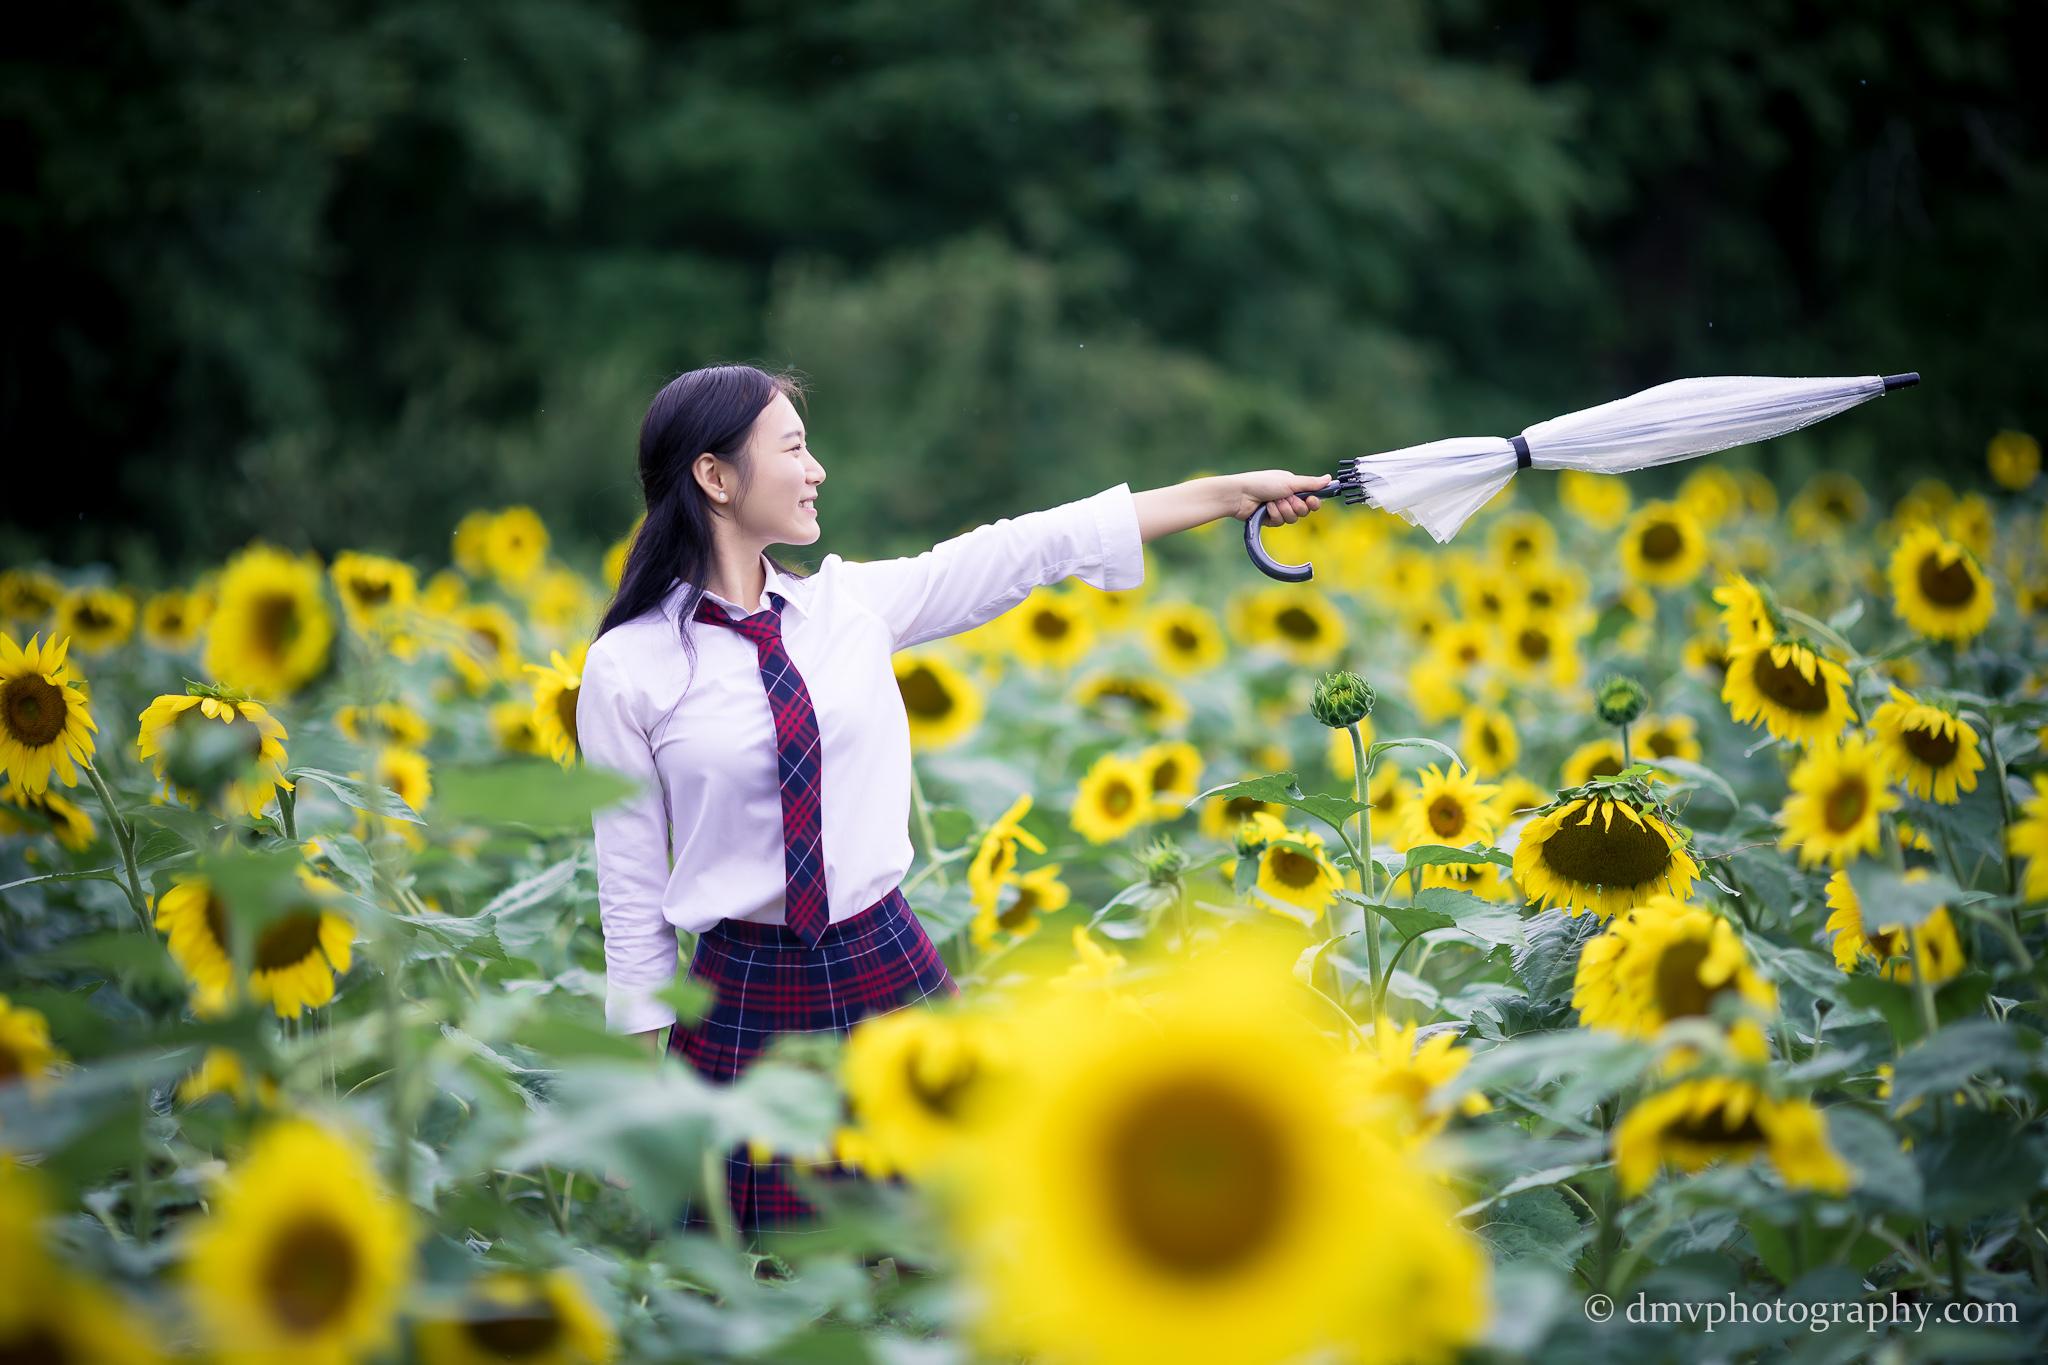 2017-07-29 - Yu Jie Sunflower - 00025